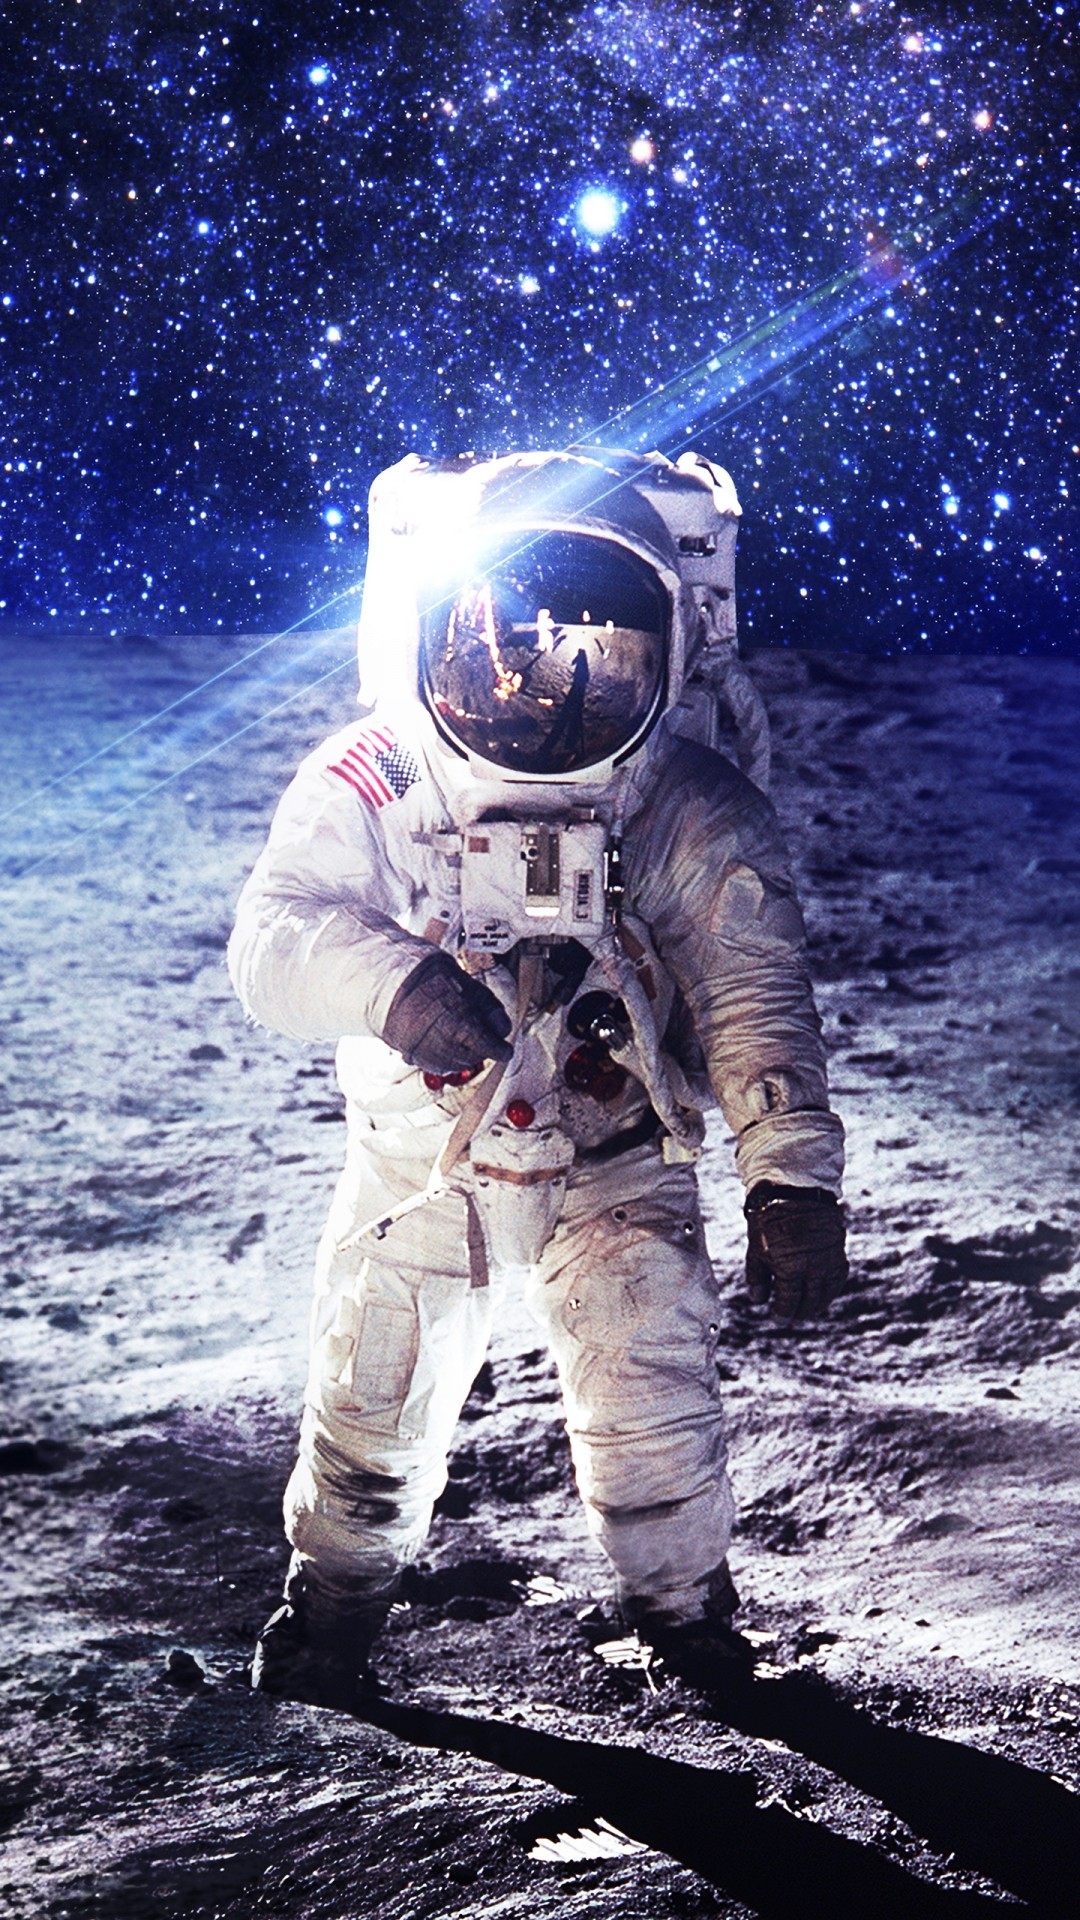 Trippy Wallpaper Iphone X Nasa Astronaut On Moon 4k Wallpapers Hd Wallpapers Id